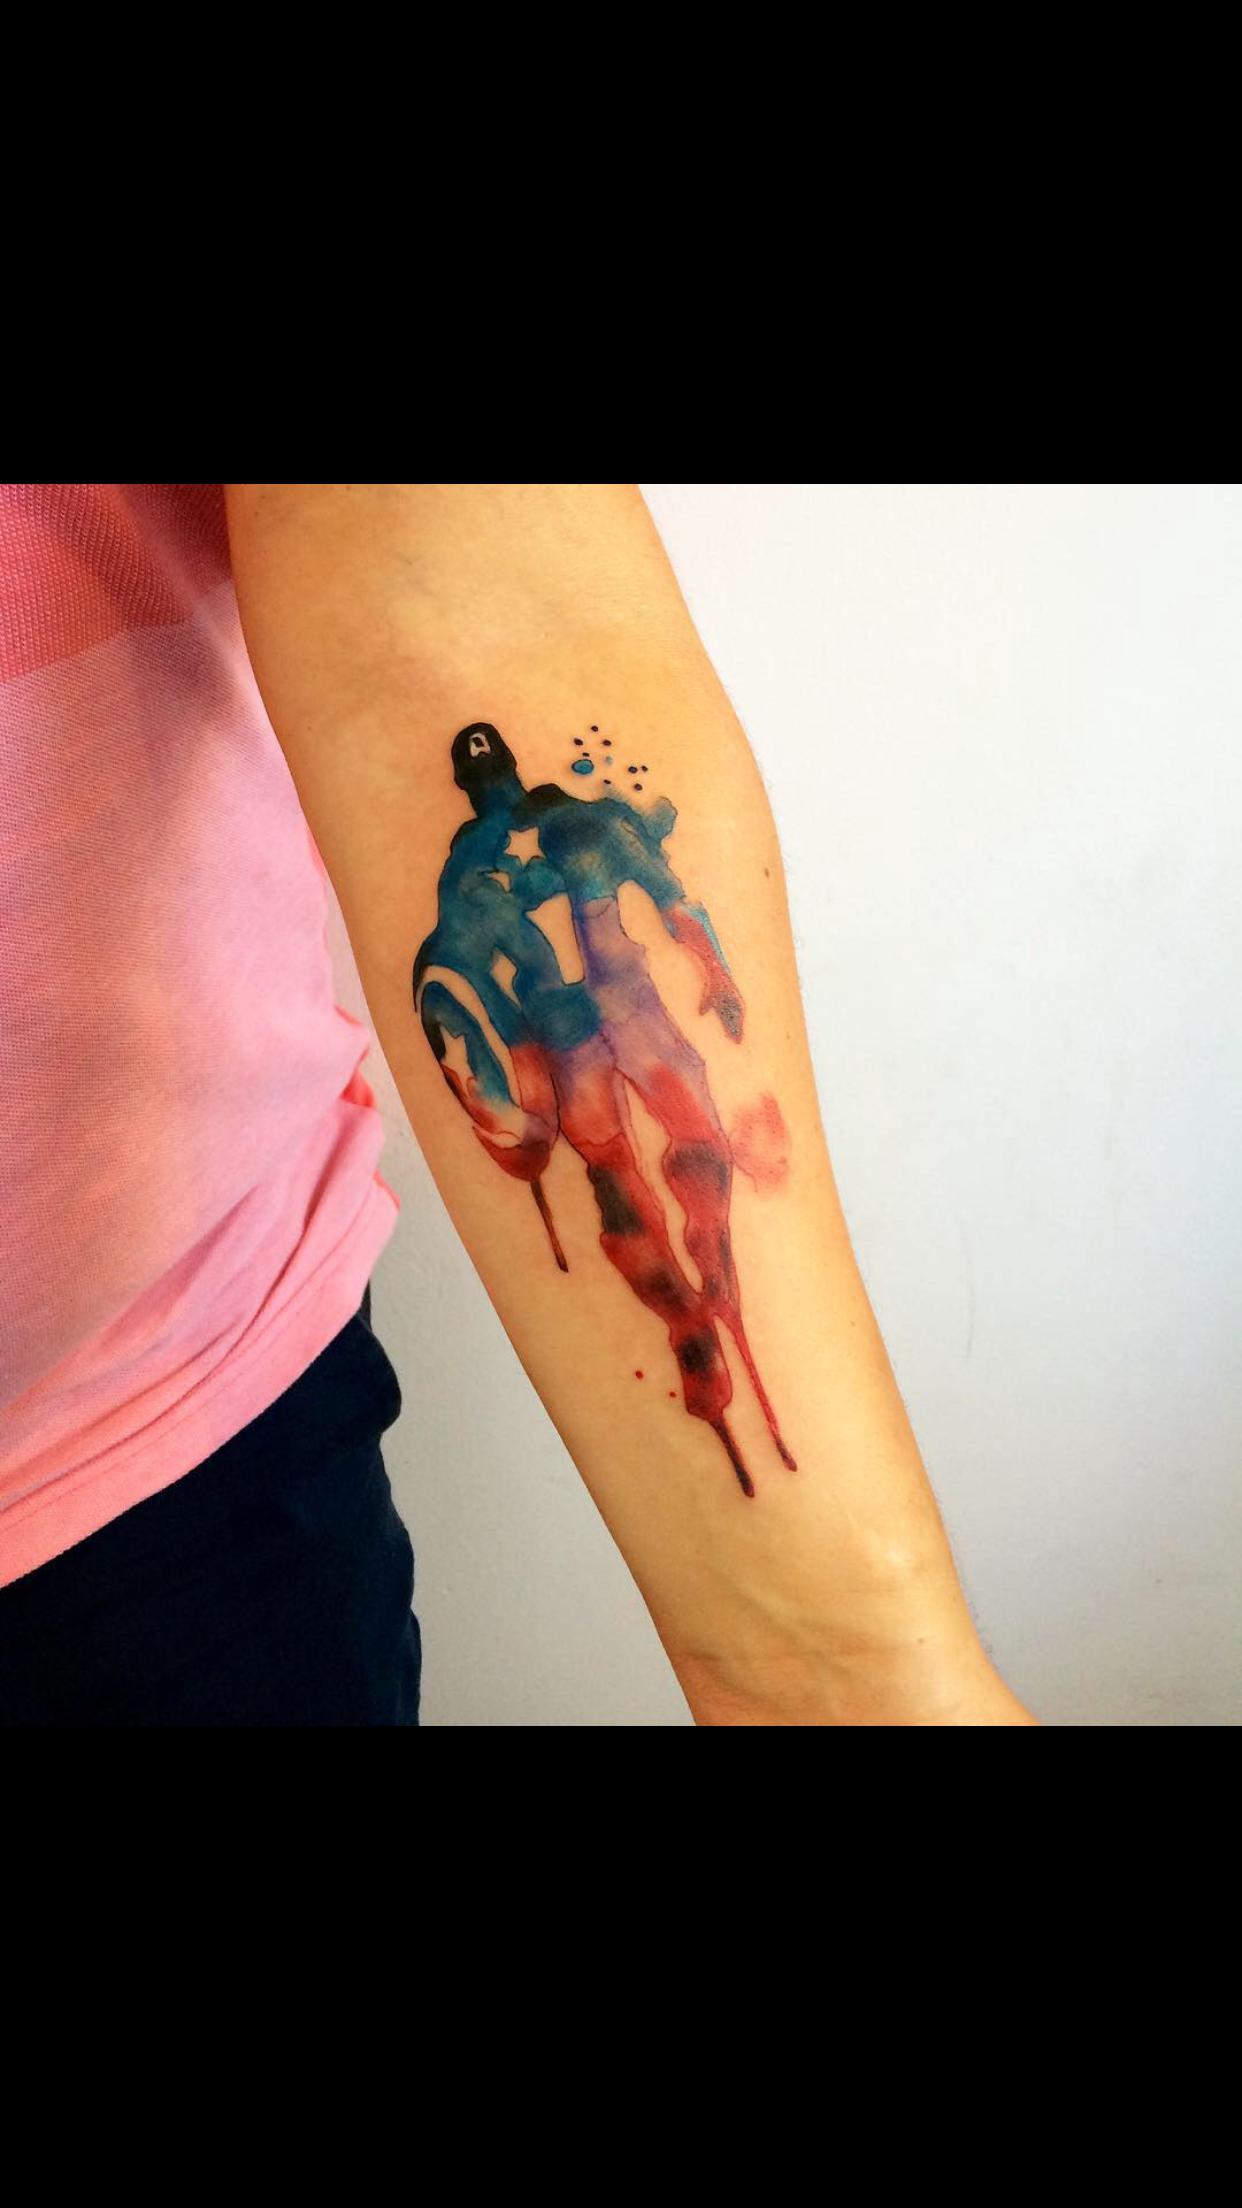 Pin by spike lawson on my hero pinterest tattoo for Three d nipple tattoos